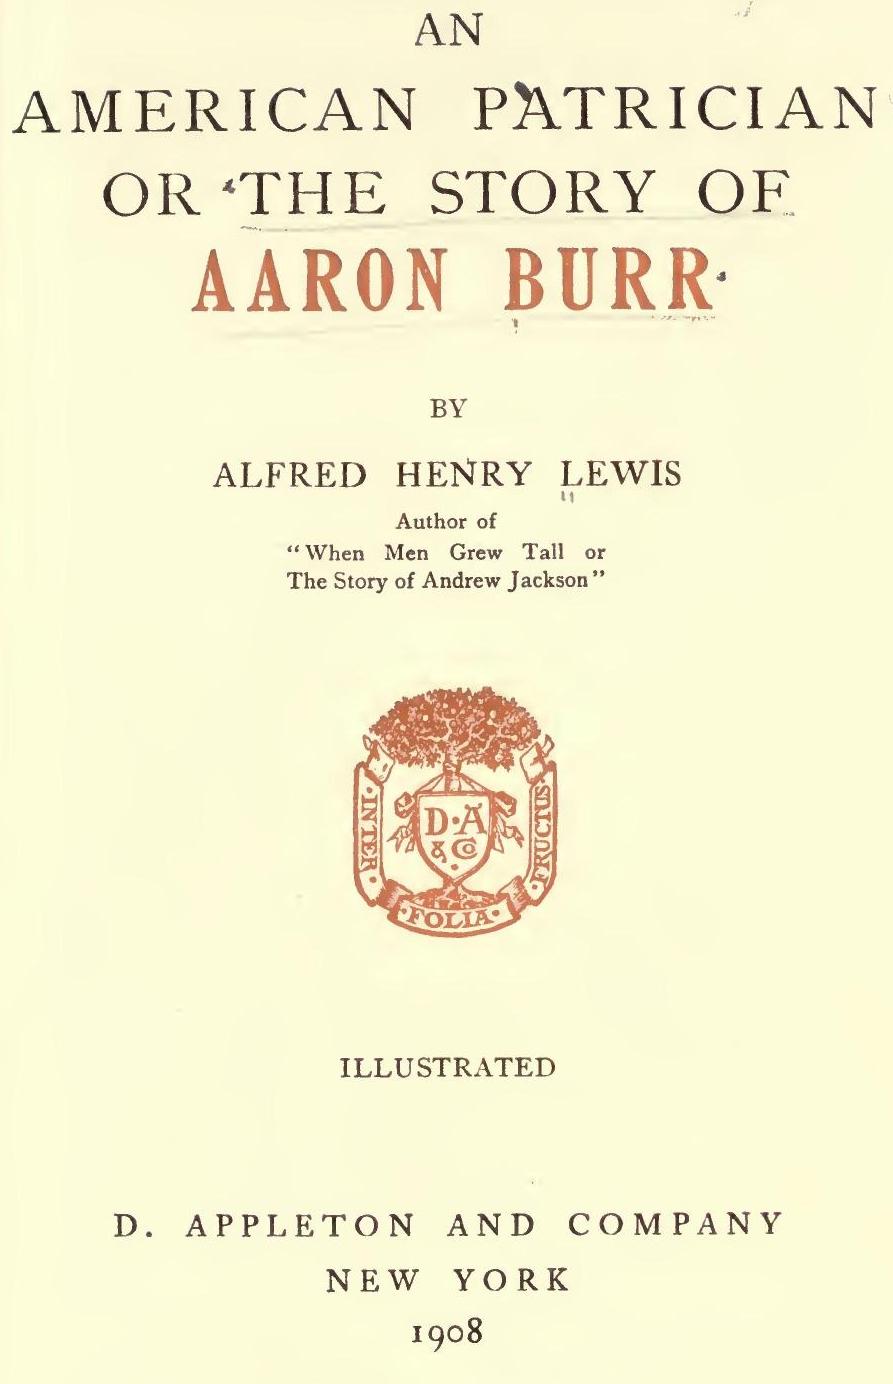 Aron name: history and description